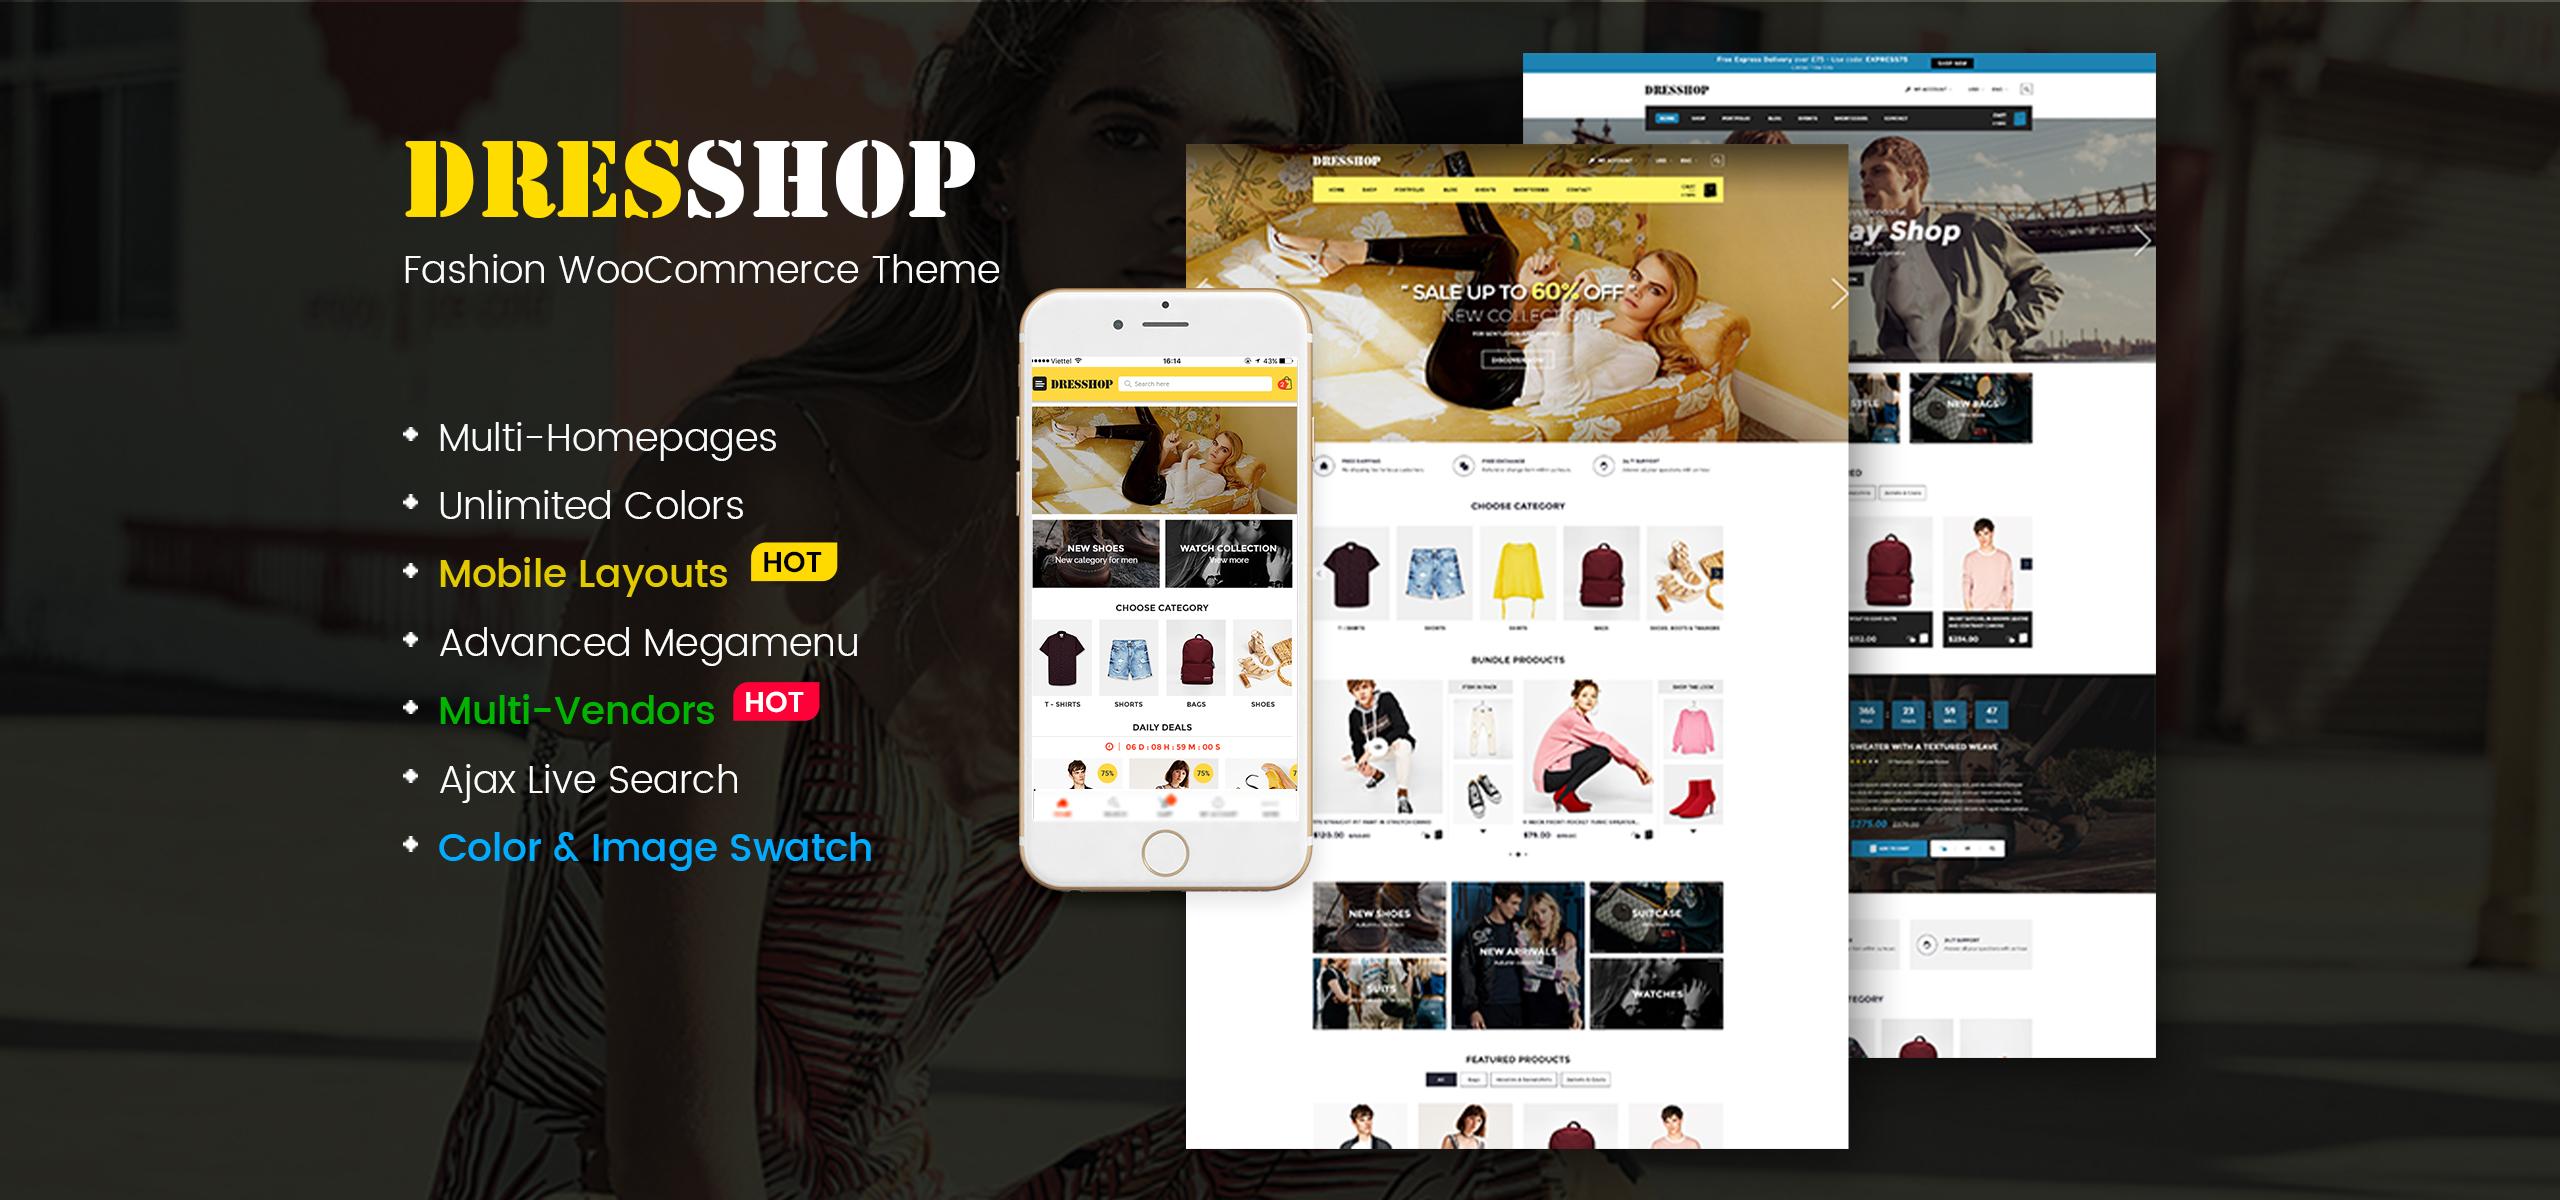 DresShop - Clean Fashion WooCommerce Theme